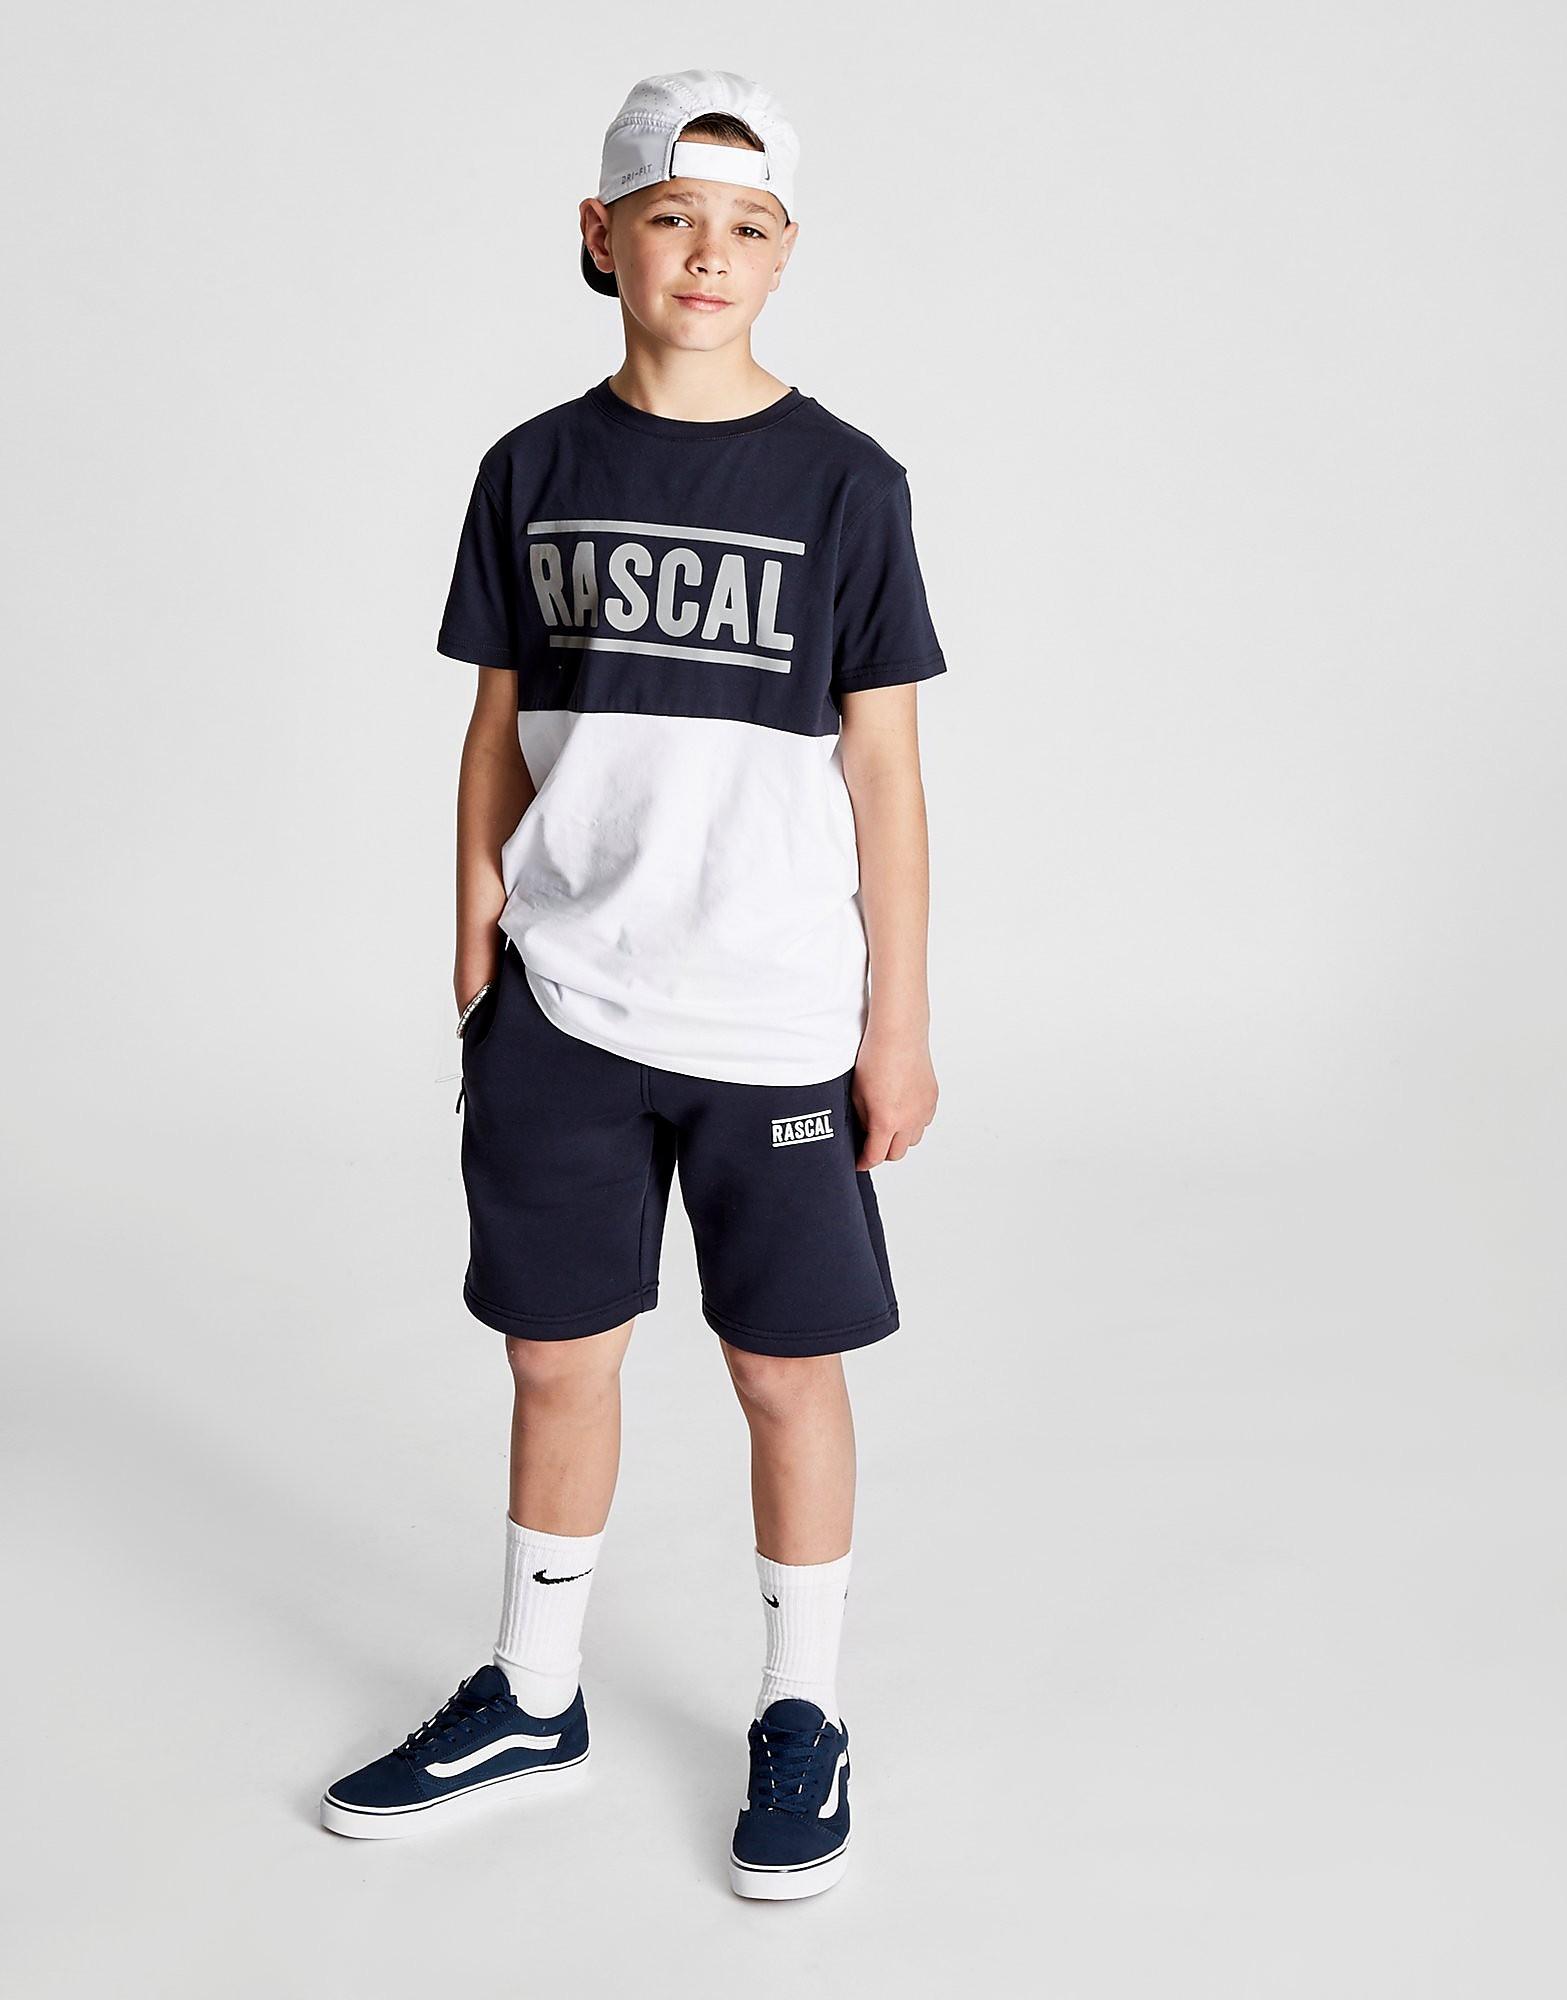 Rascal Short Essential Junior